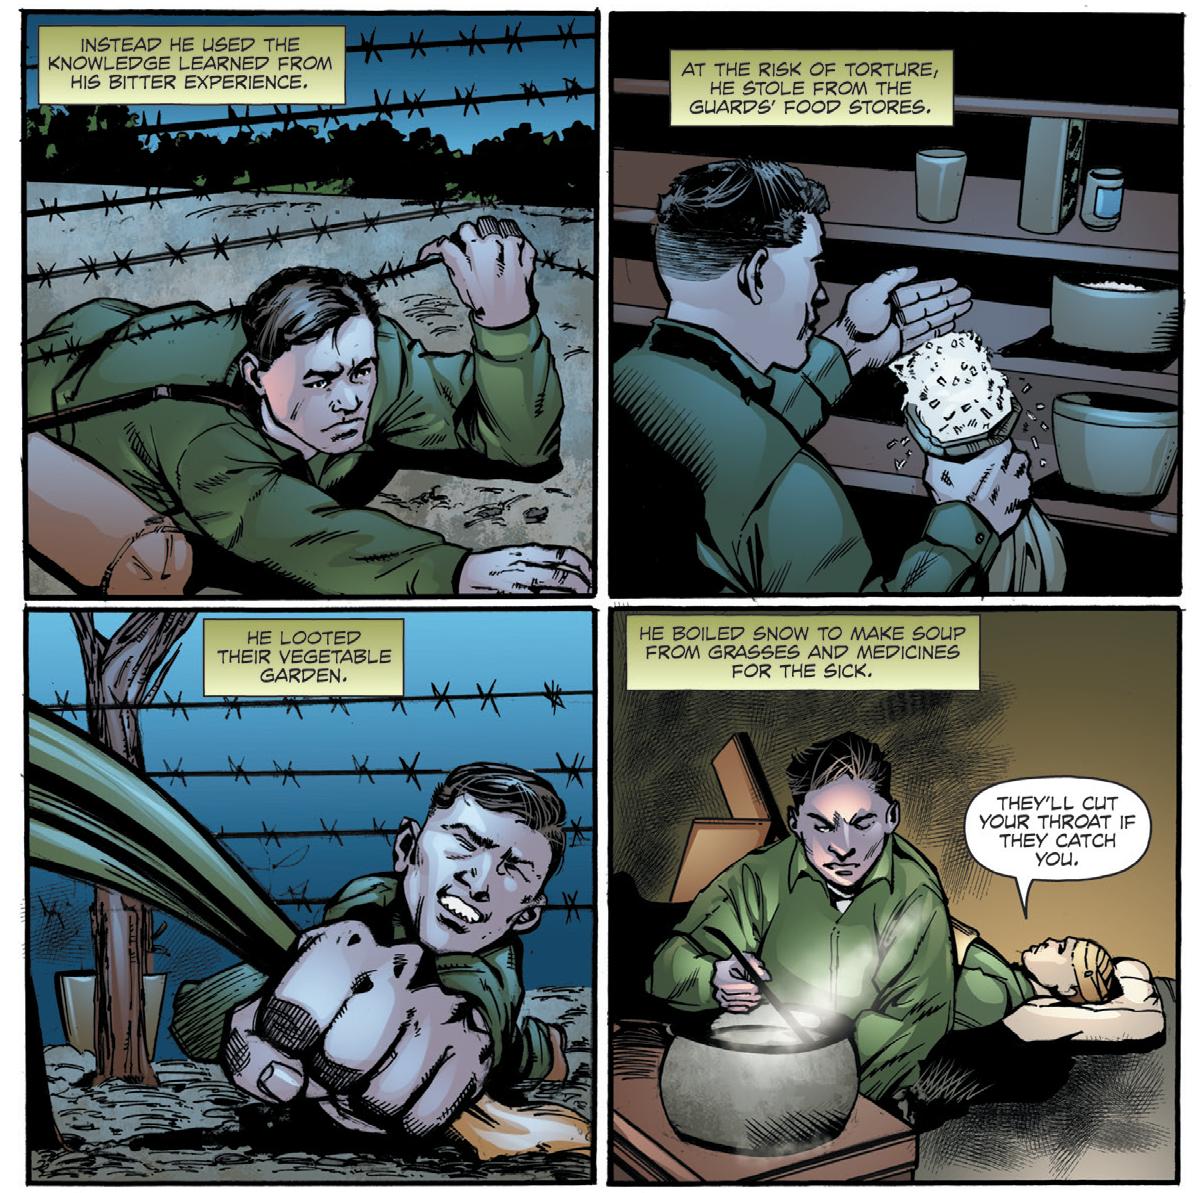 Holocaust survivor, Korean War hero, and one-man wrecking crew: New comic celebrates MoH recipient Tibor Rubin